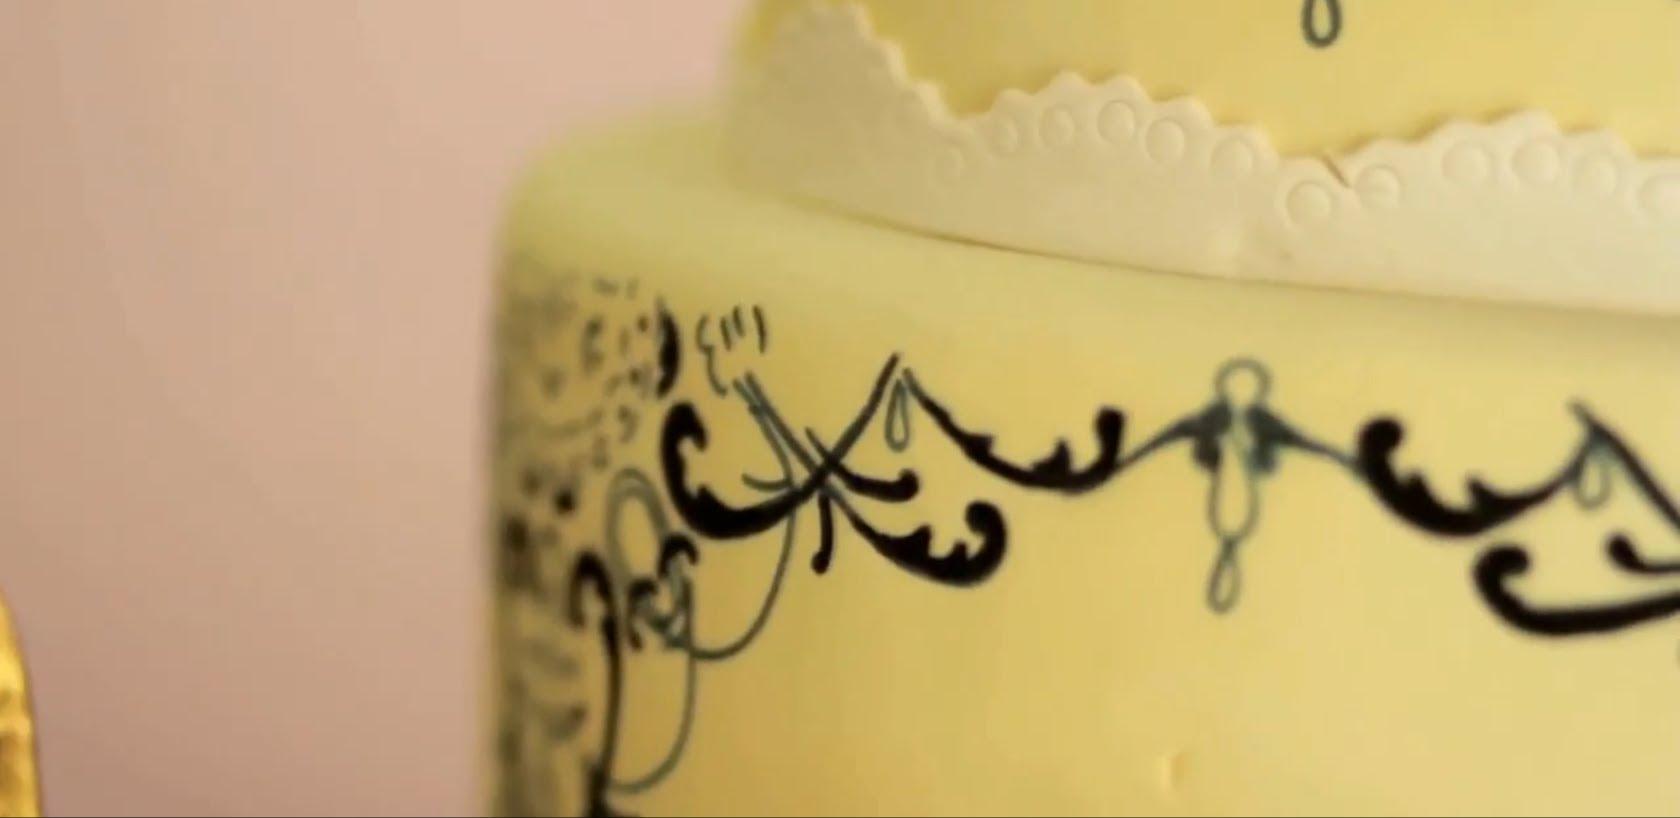 Как се прави украса на торти